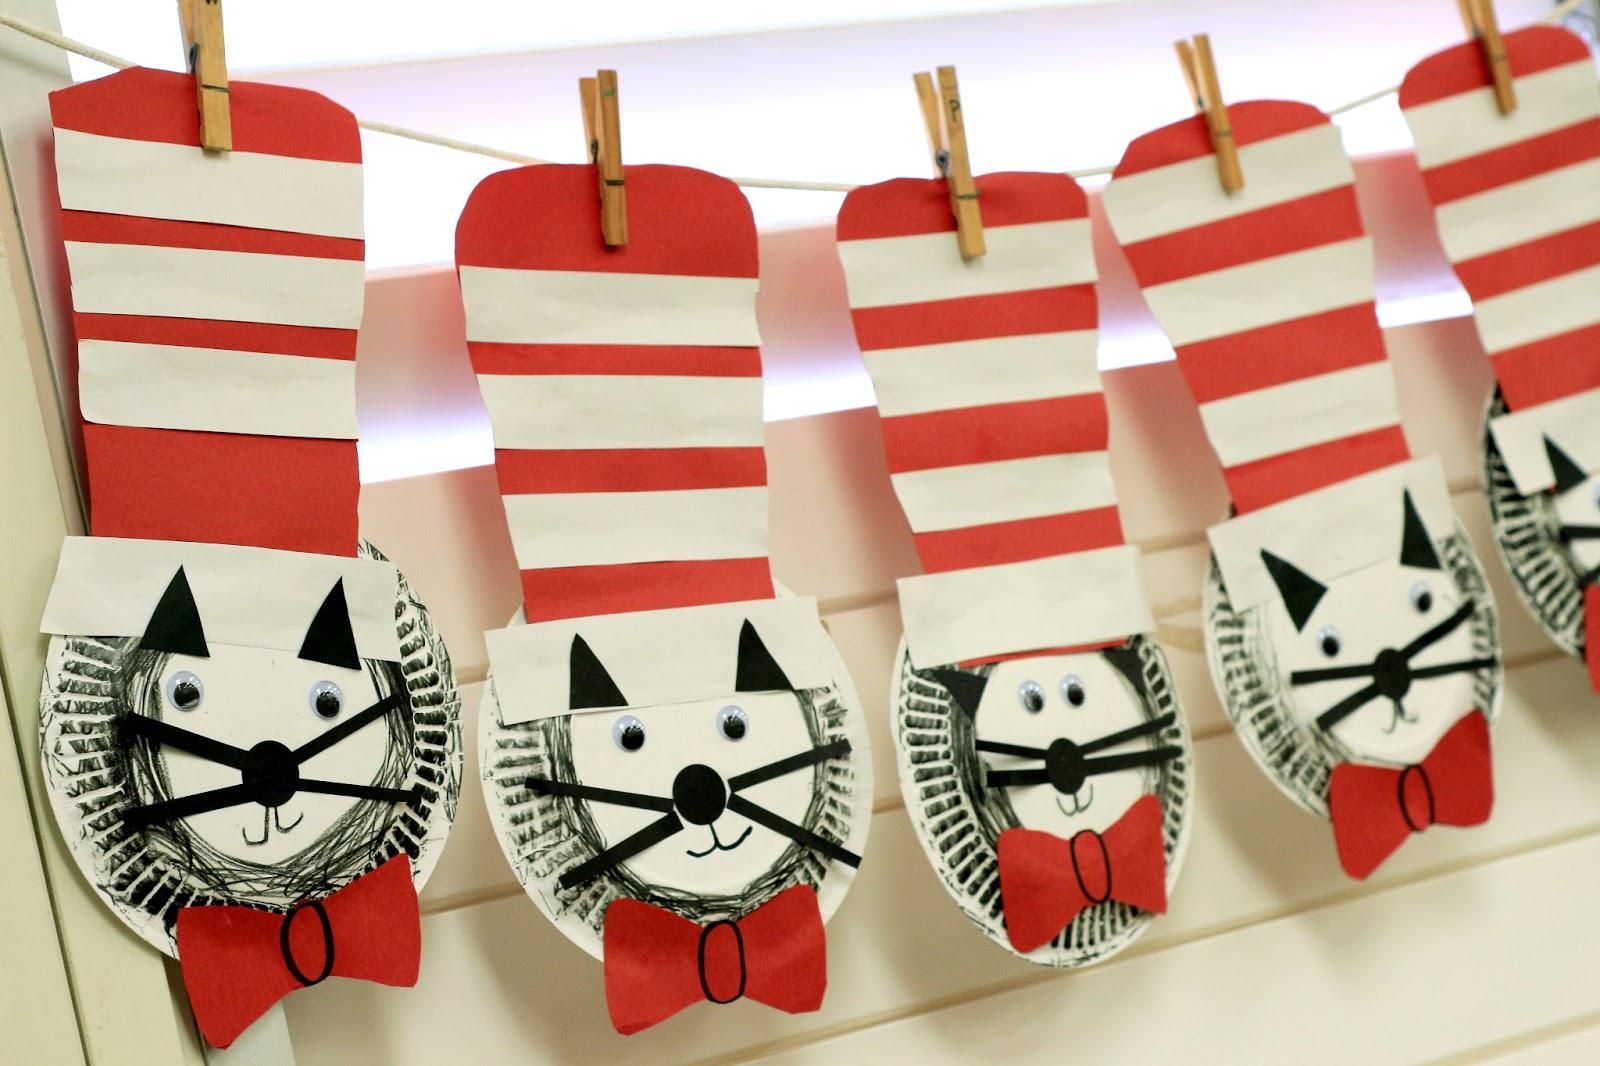 March crafts for kindergarten - Saturday March 1 2014